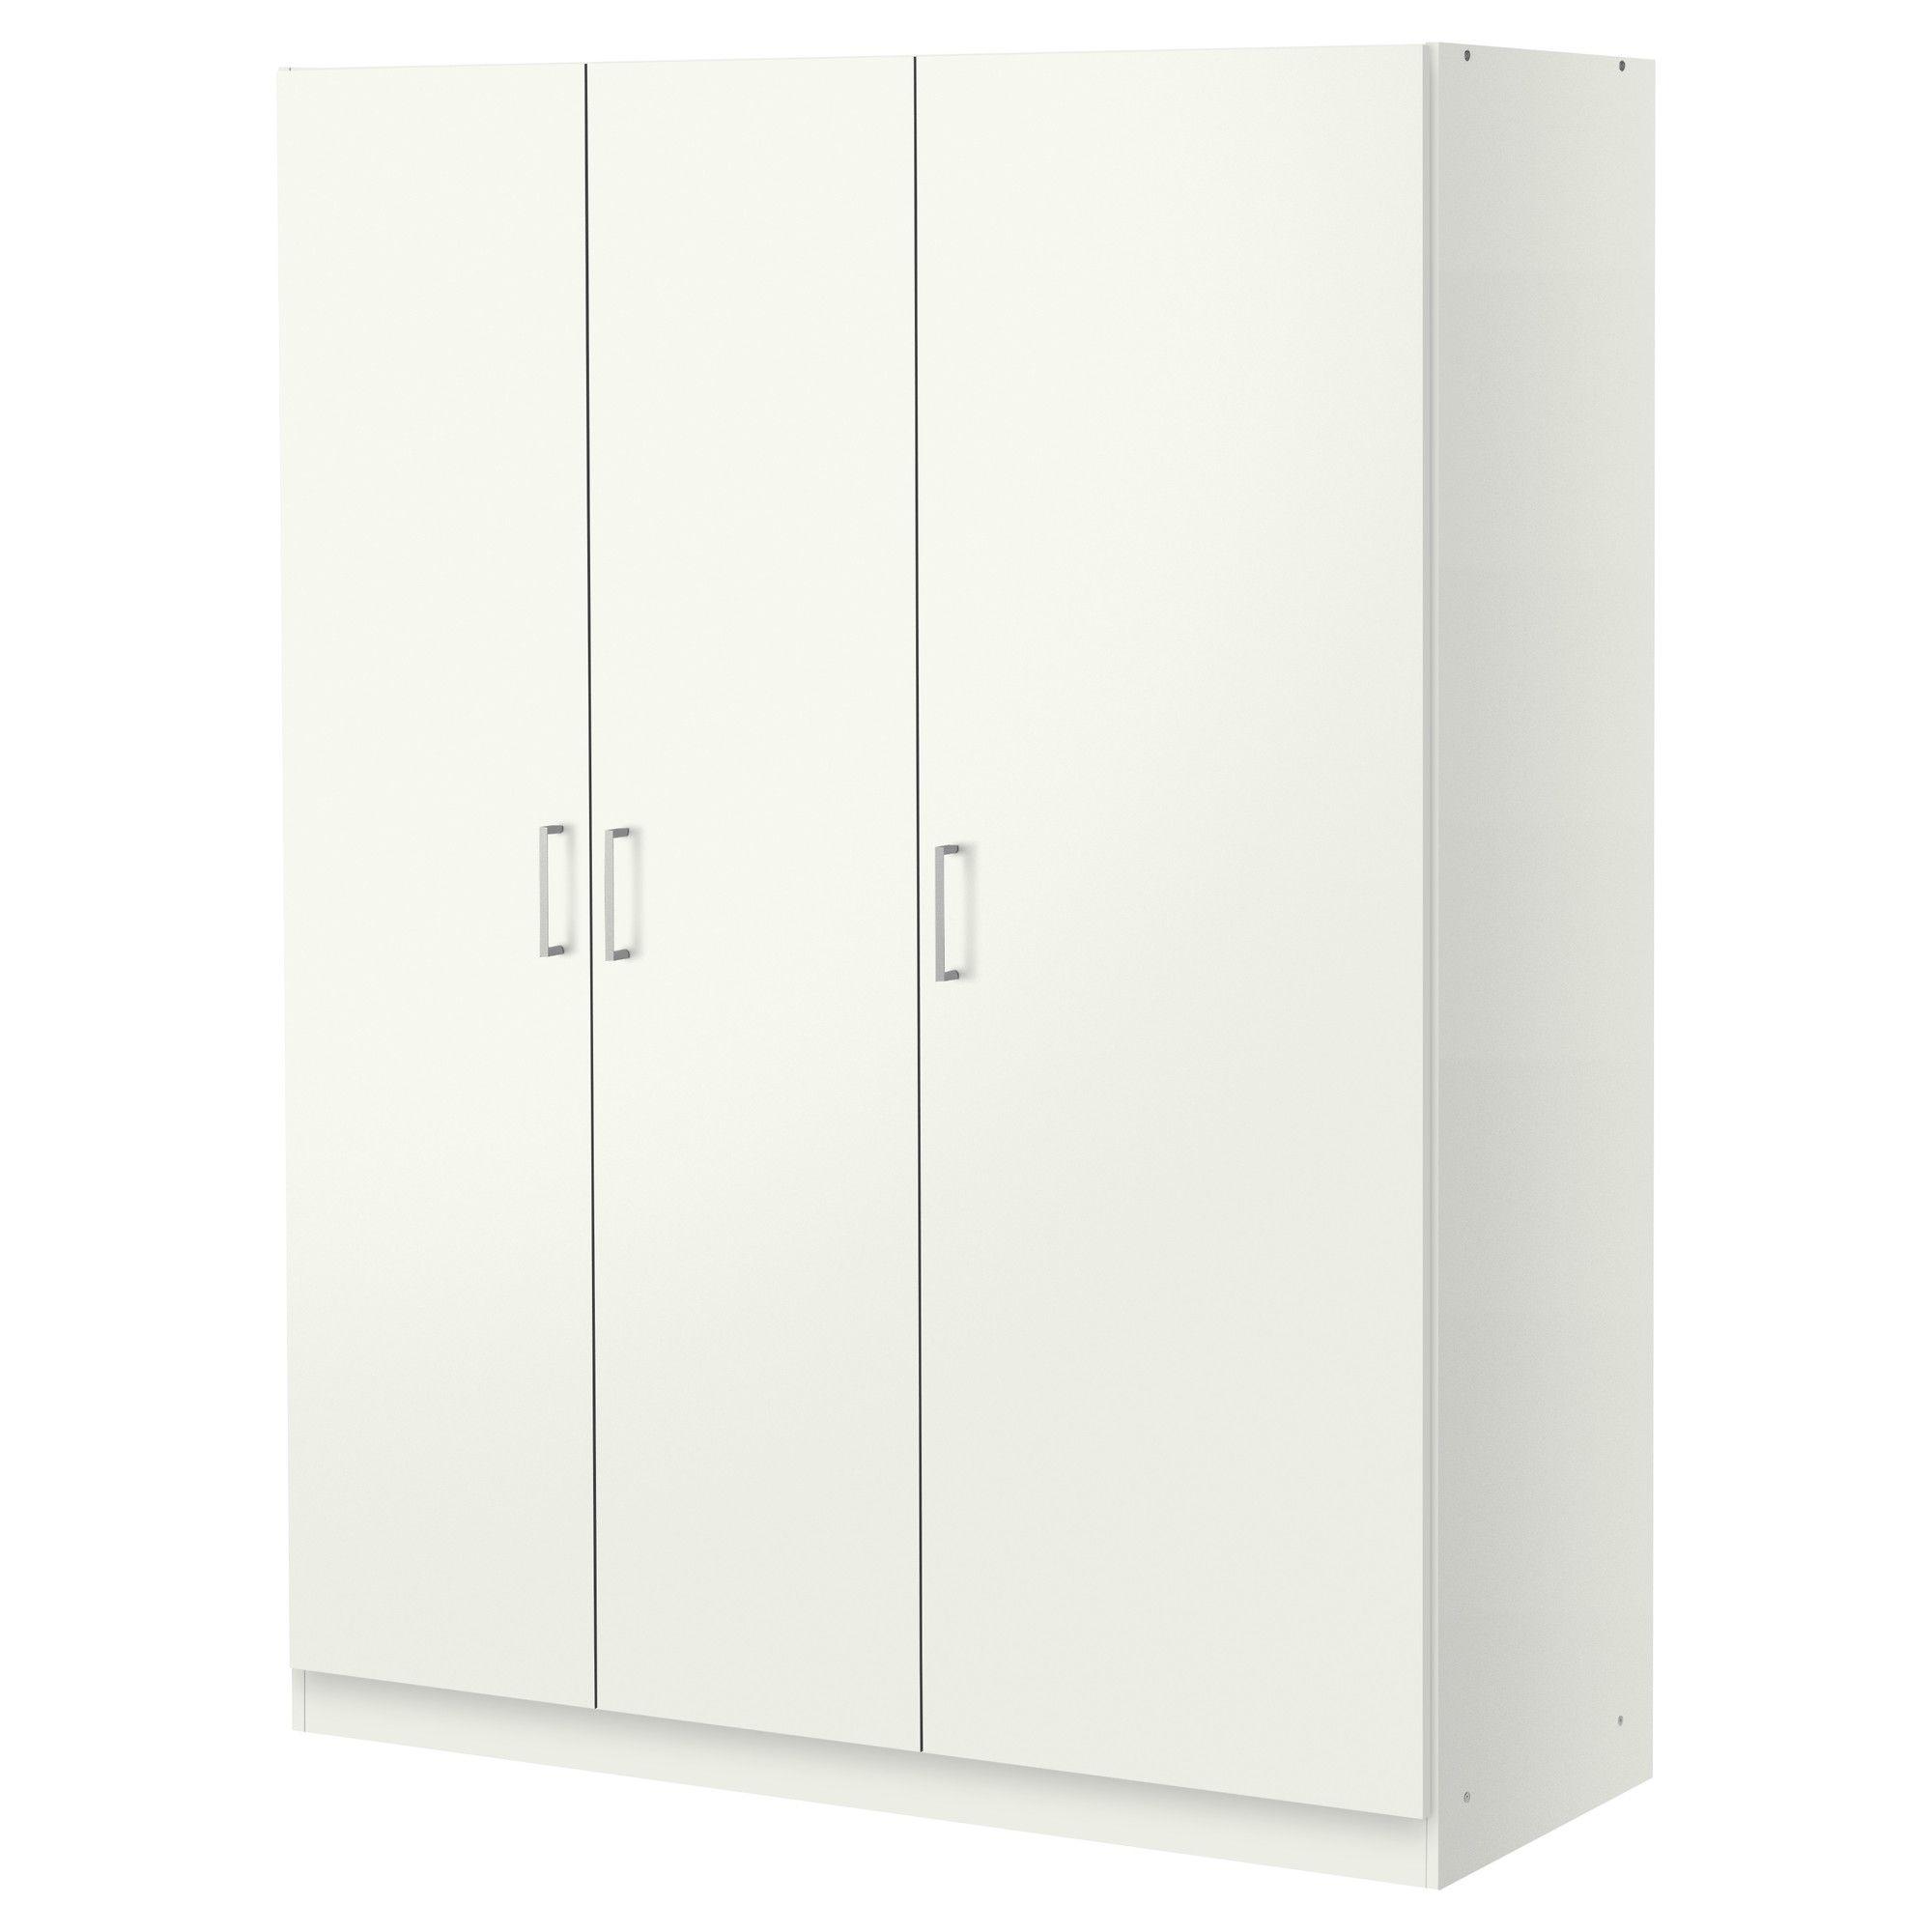 DOMBÅS Garderob, vit | Clothes rail, Shelves and Spaces